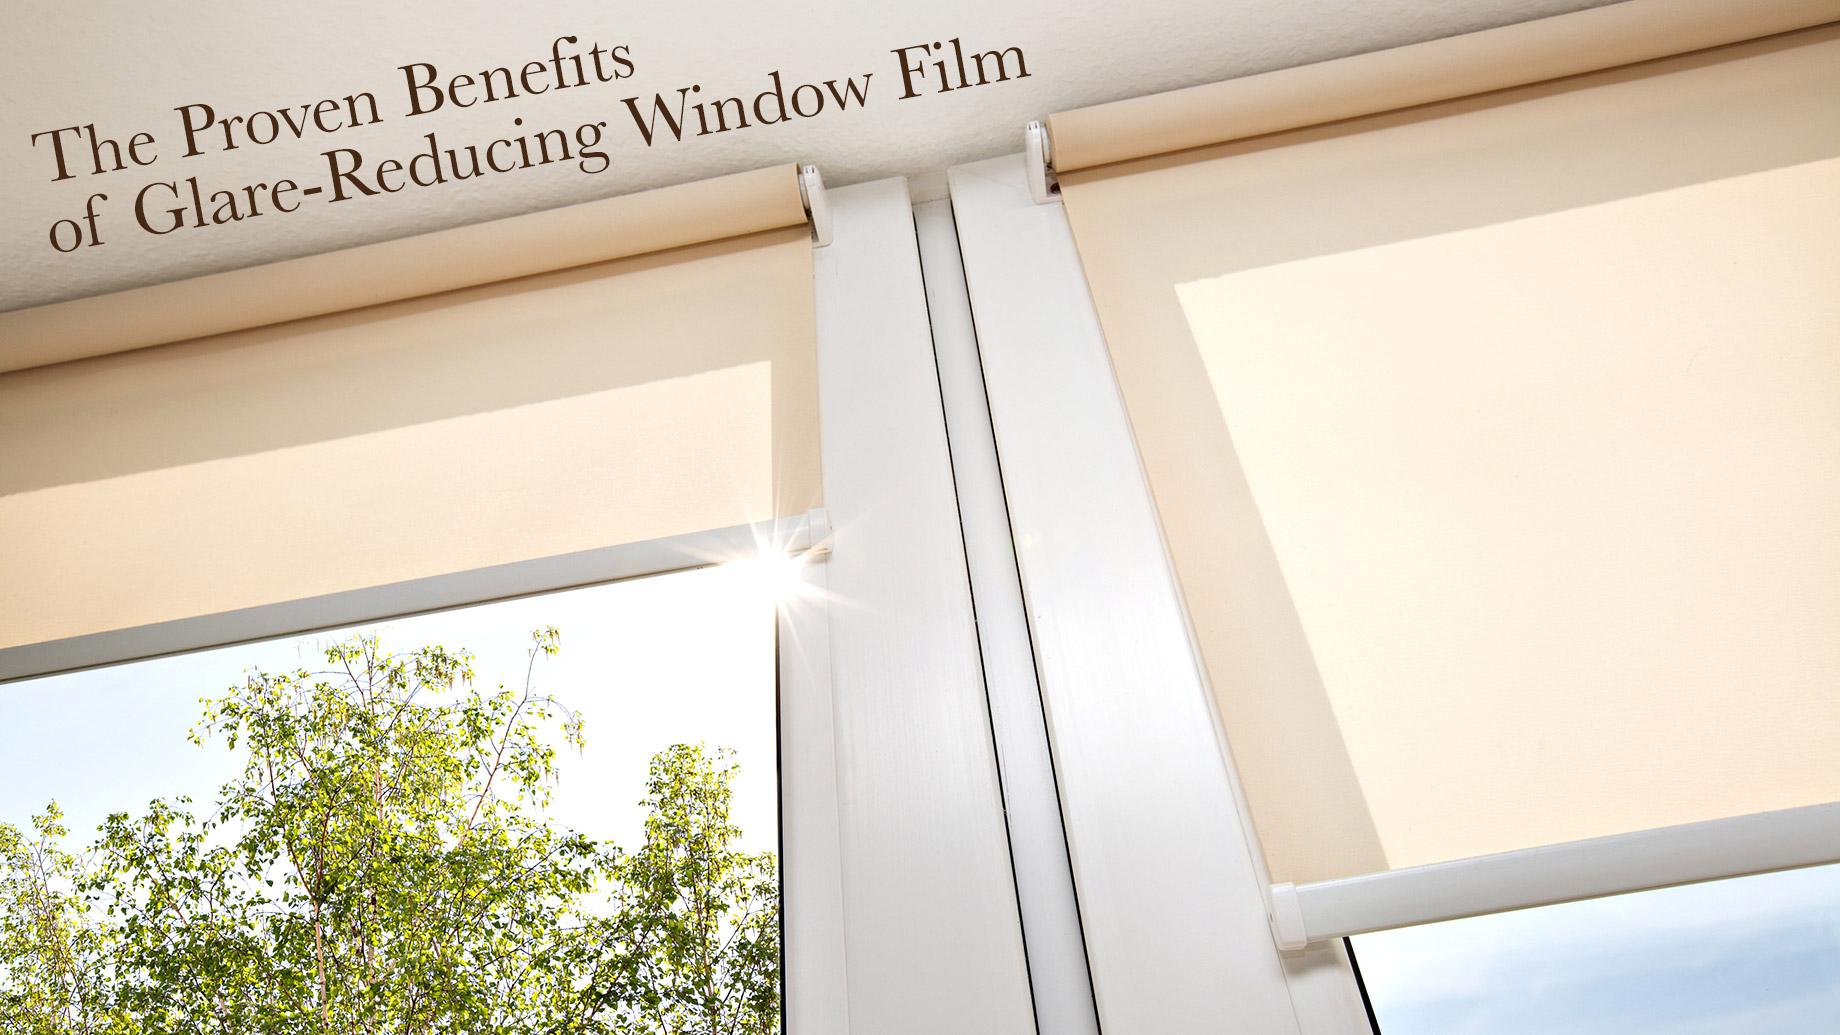 The Proven Benefits of Glare-Reducing Window Film